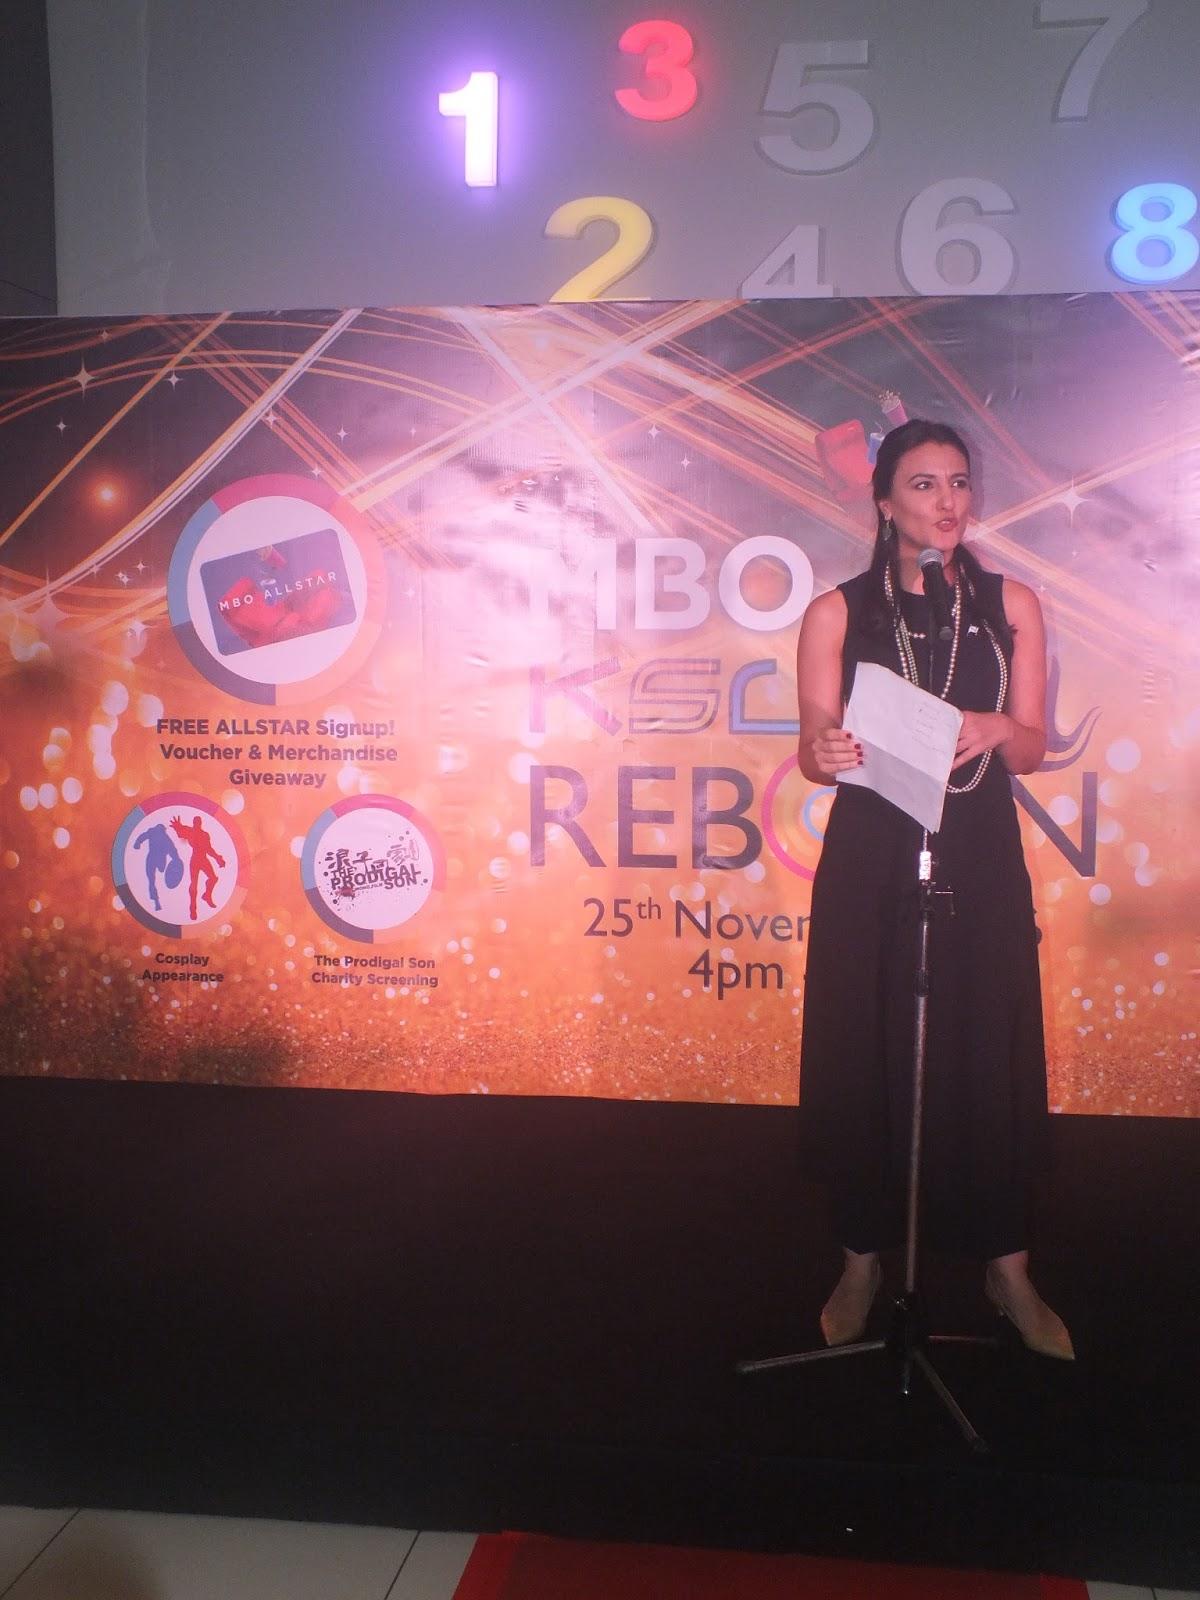 Mbo Cinema Ksl Showtime Film And Arts Programacion 2011